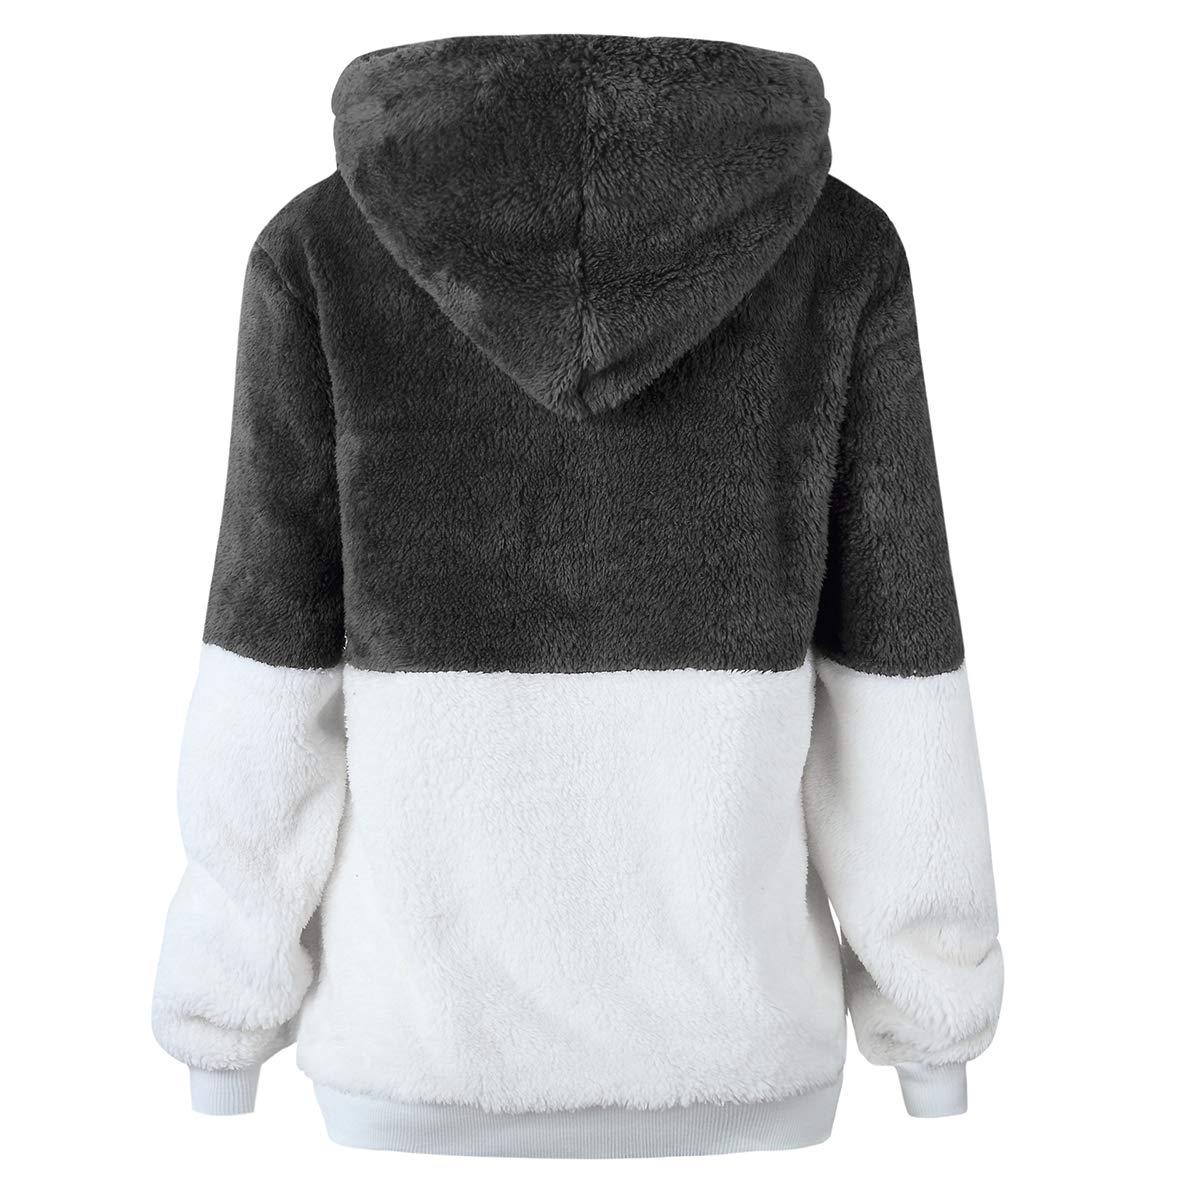 Amazon.com: Borlai - Sudadera con capucha para mujer, manga ...